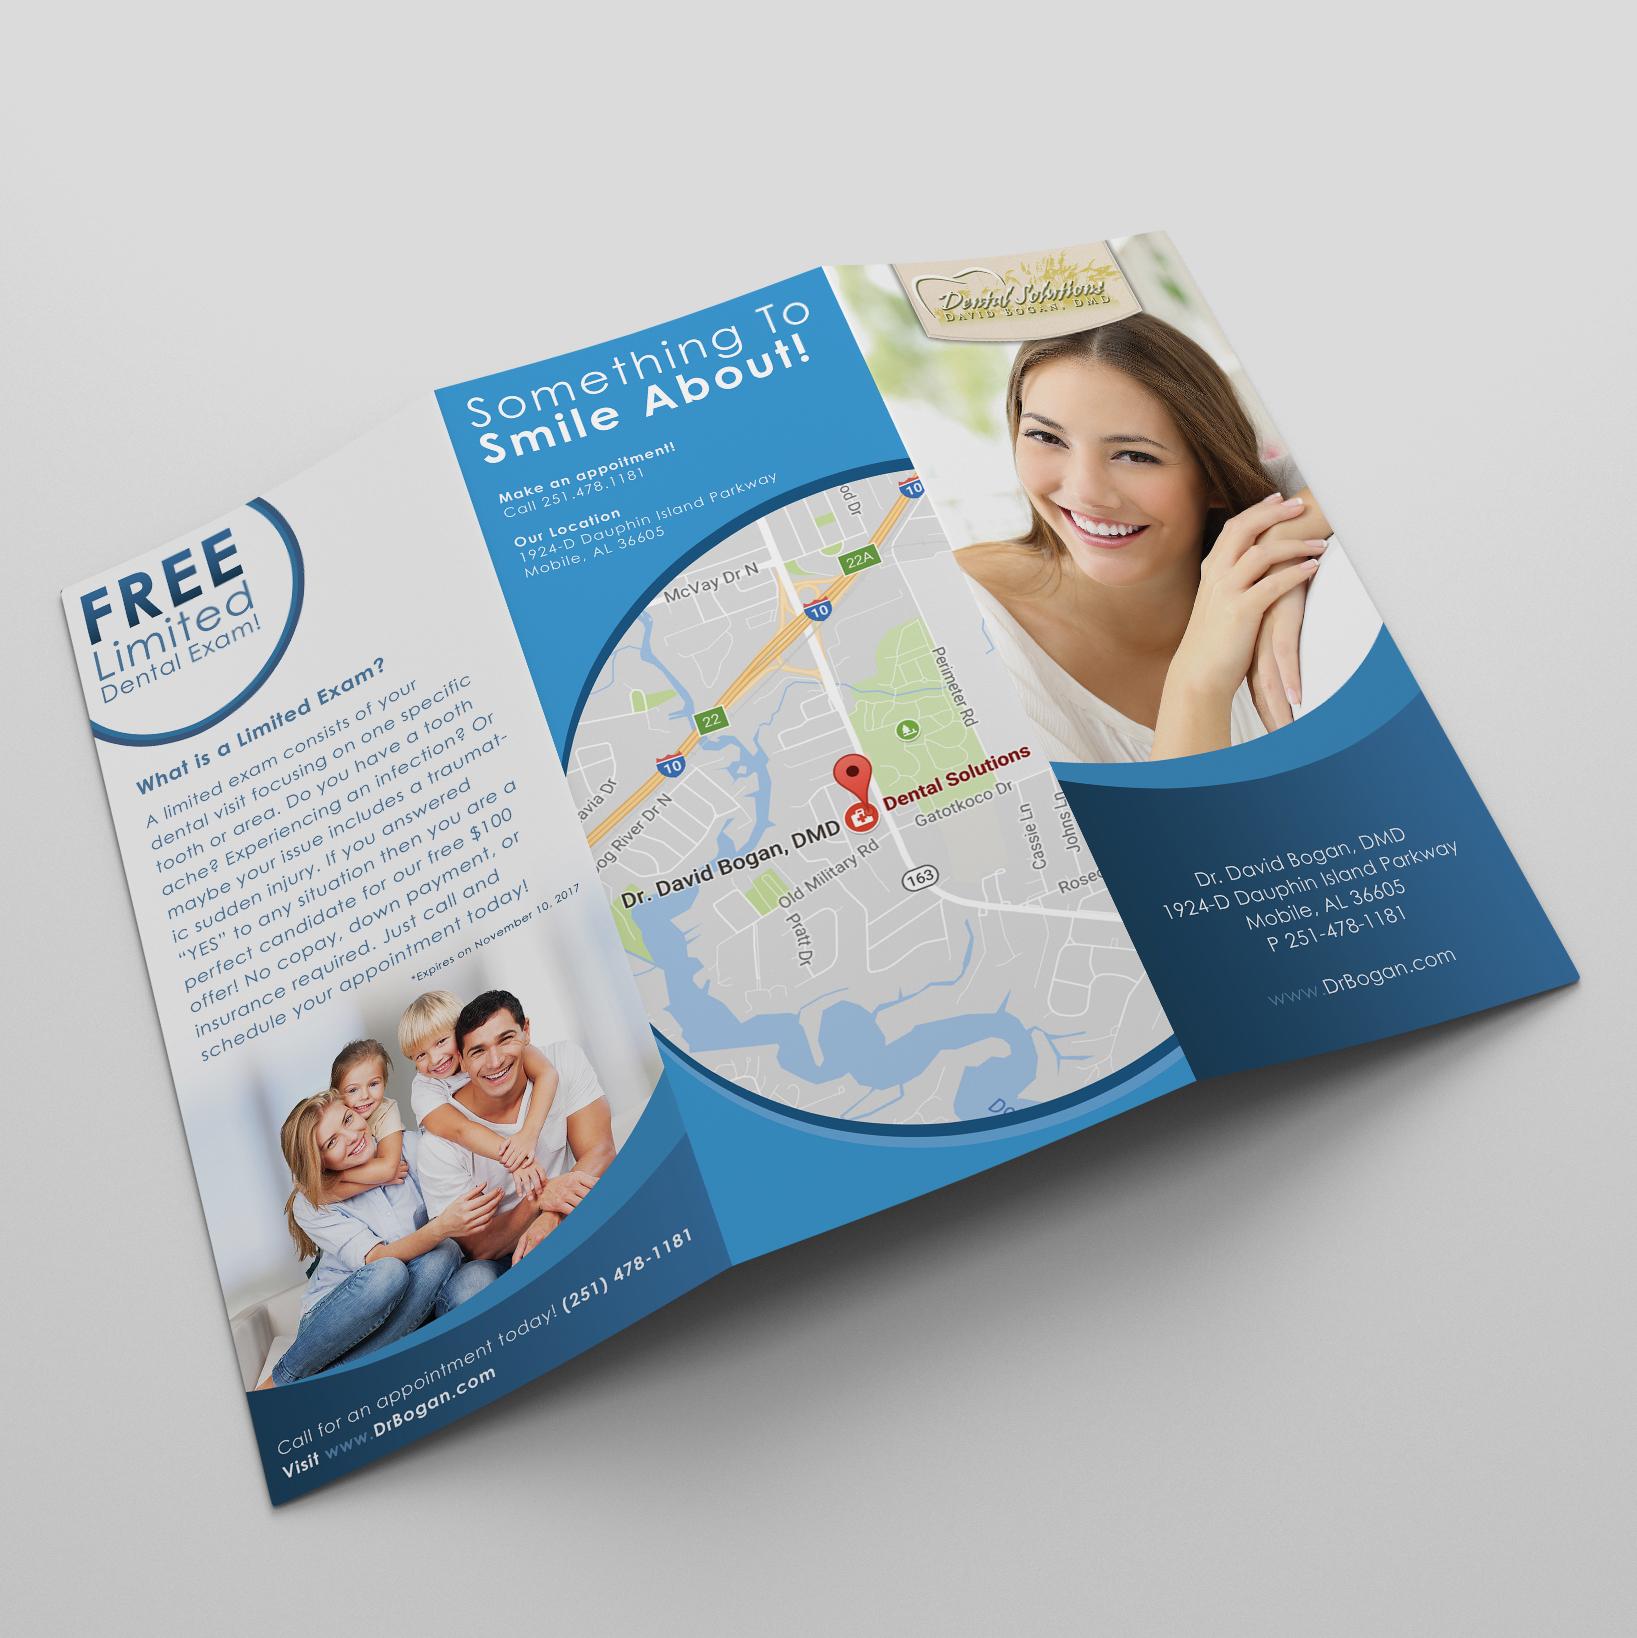 Front of Brochure for Dental Solutions in Mobile, Alabama